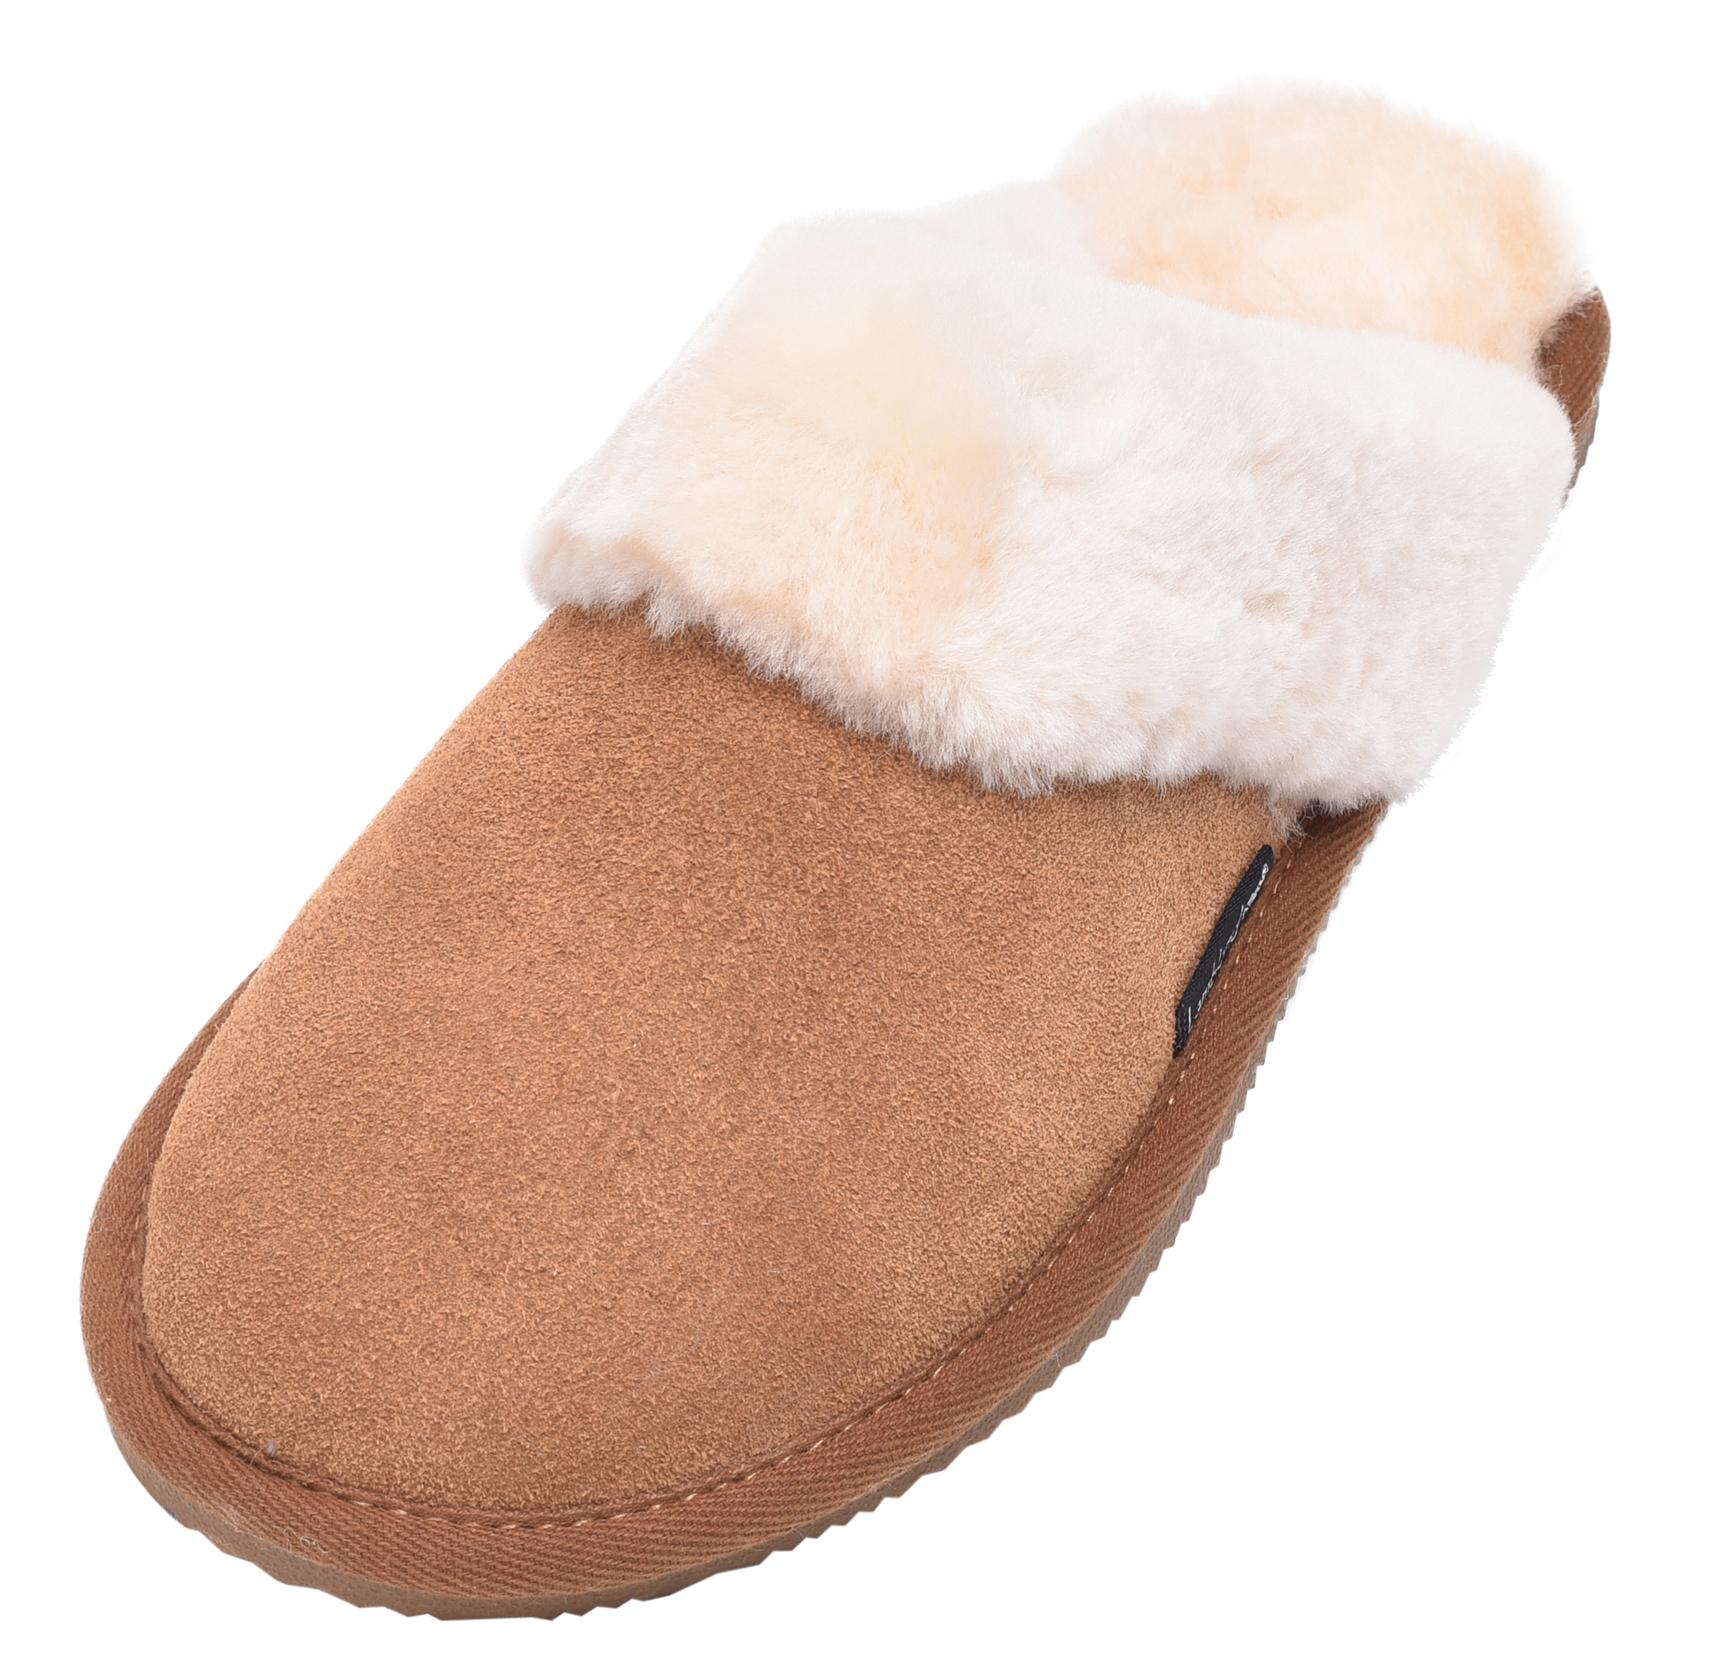 Lambland Ladies Full Sheepskin Mule Slippers with Sheepskin Cuff and EVA Sole